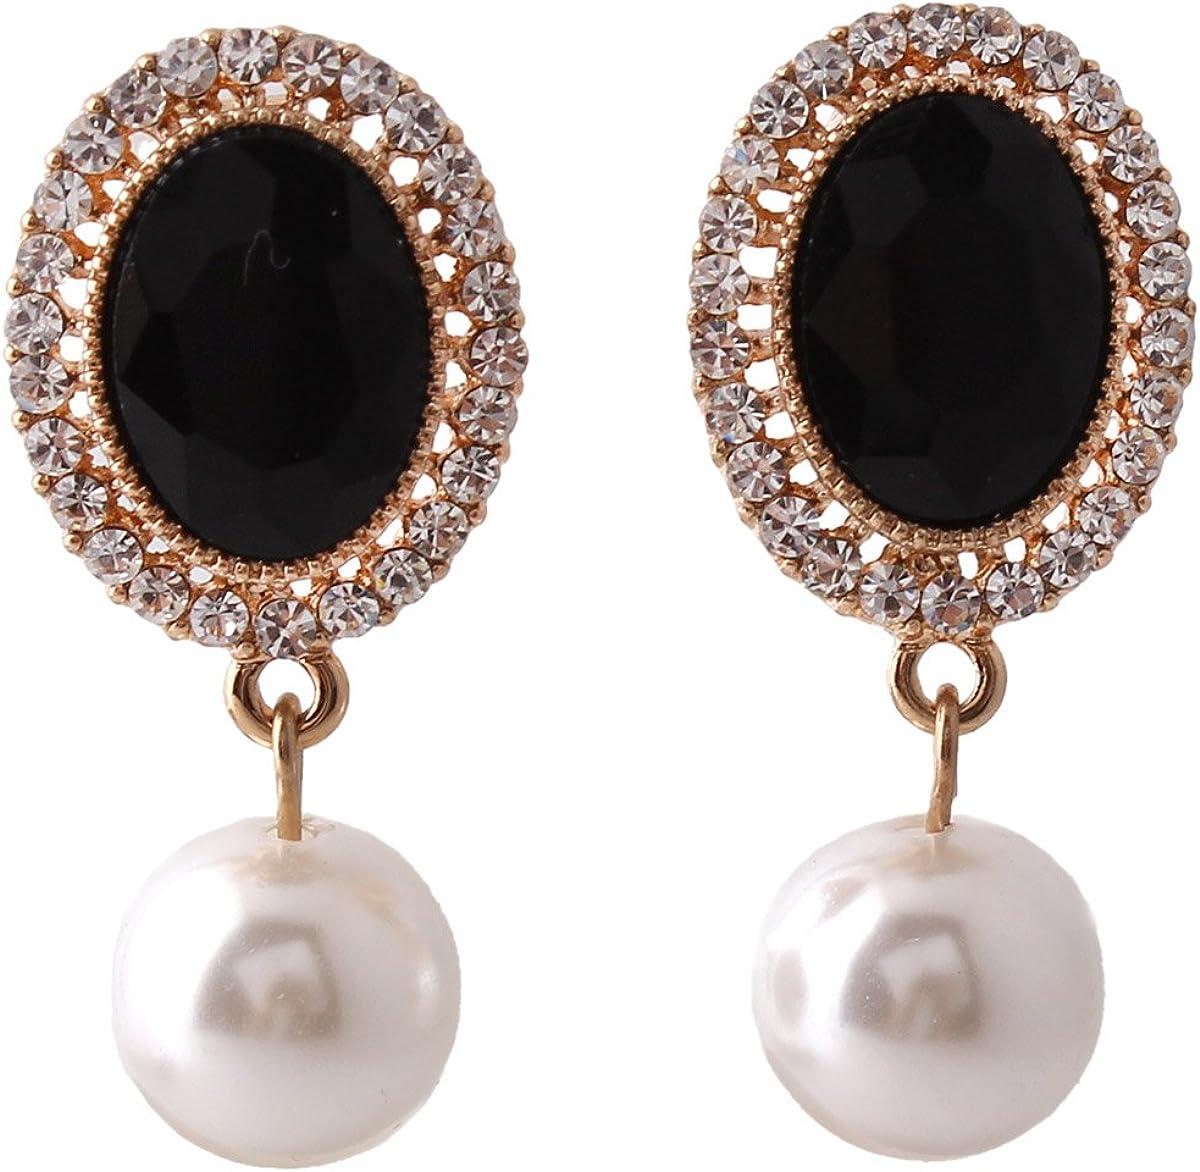 Grace Jun Gold Plated Rhinestone Crystal Simulated Pearl Clip-on Drop Earrings